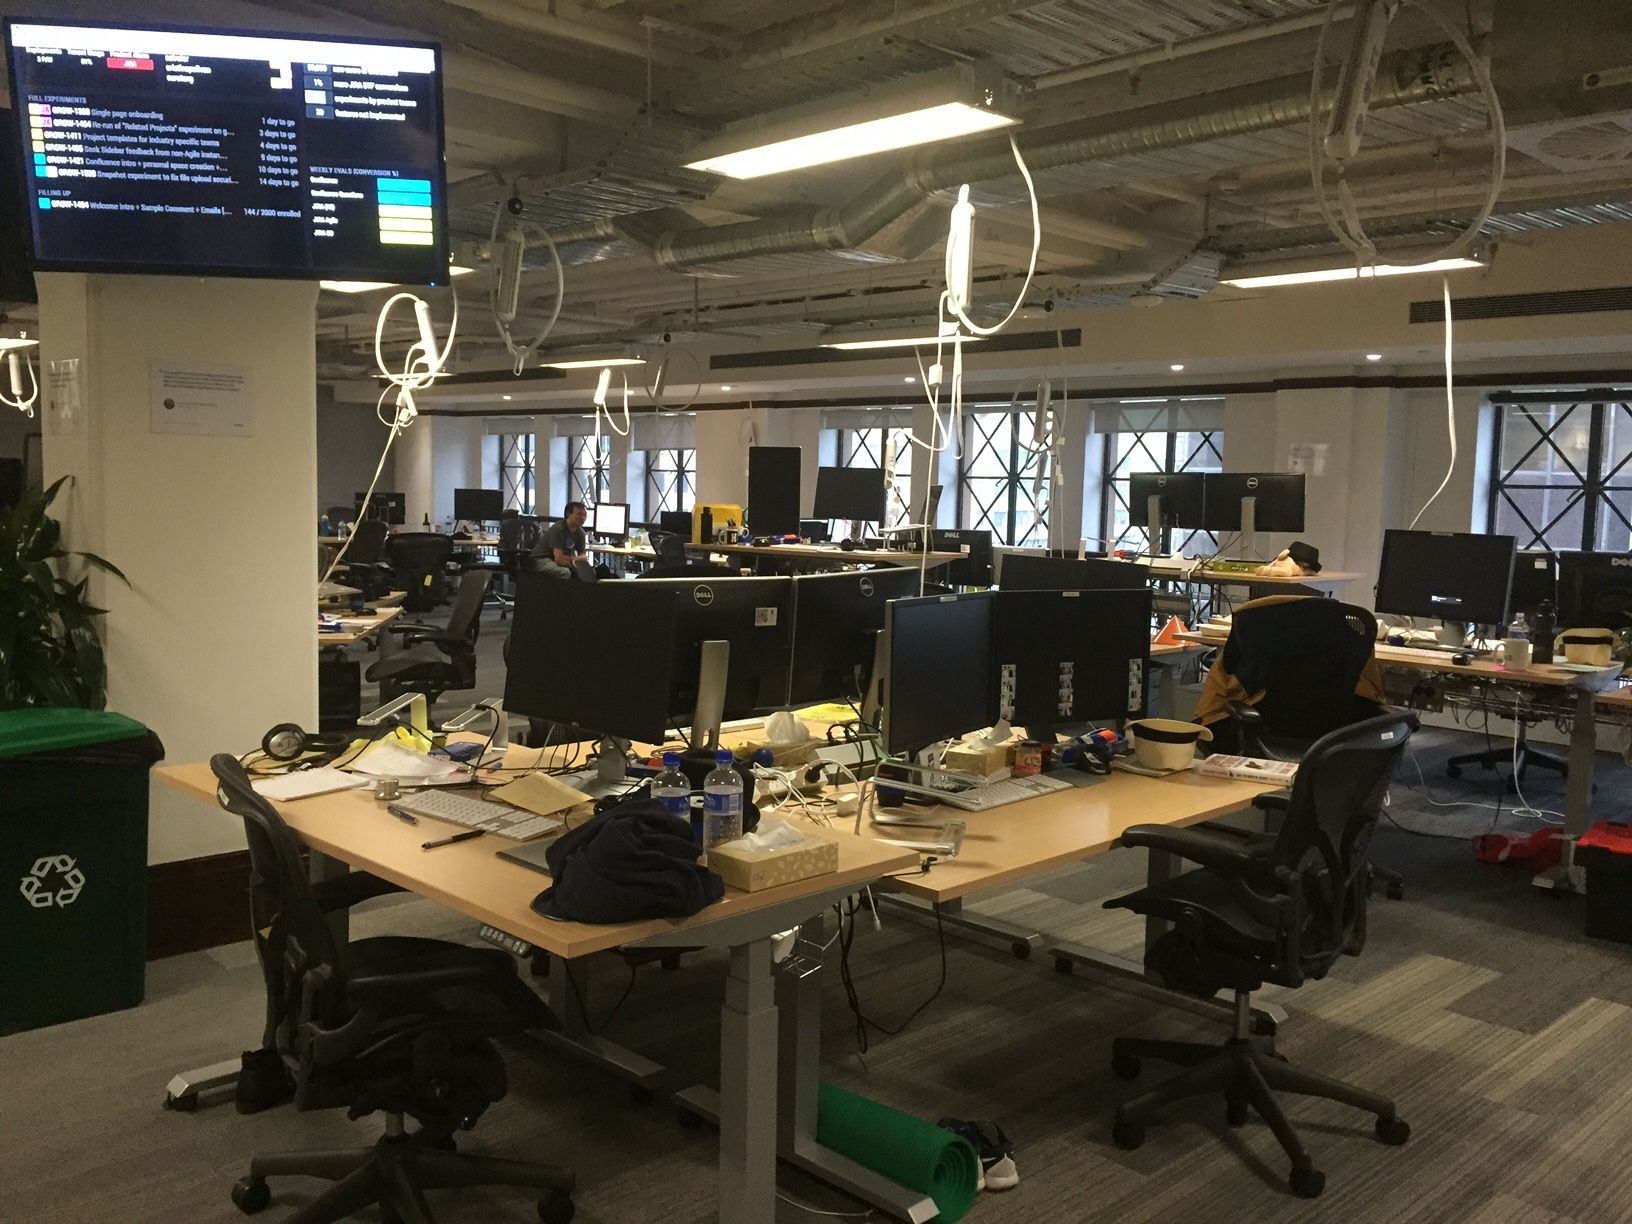 sydney office. photos: inside the new sydney office for atlassian, australia\u0027s greatest tech success | business insider interior pinterest sydney,